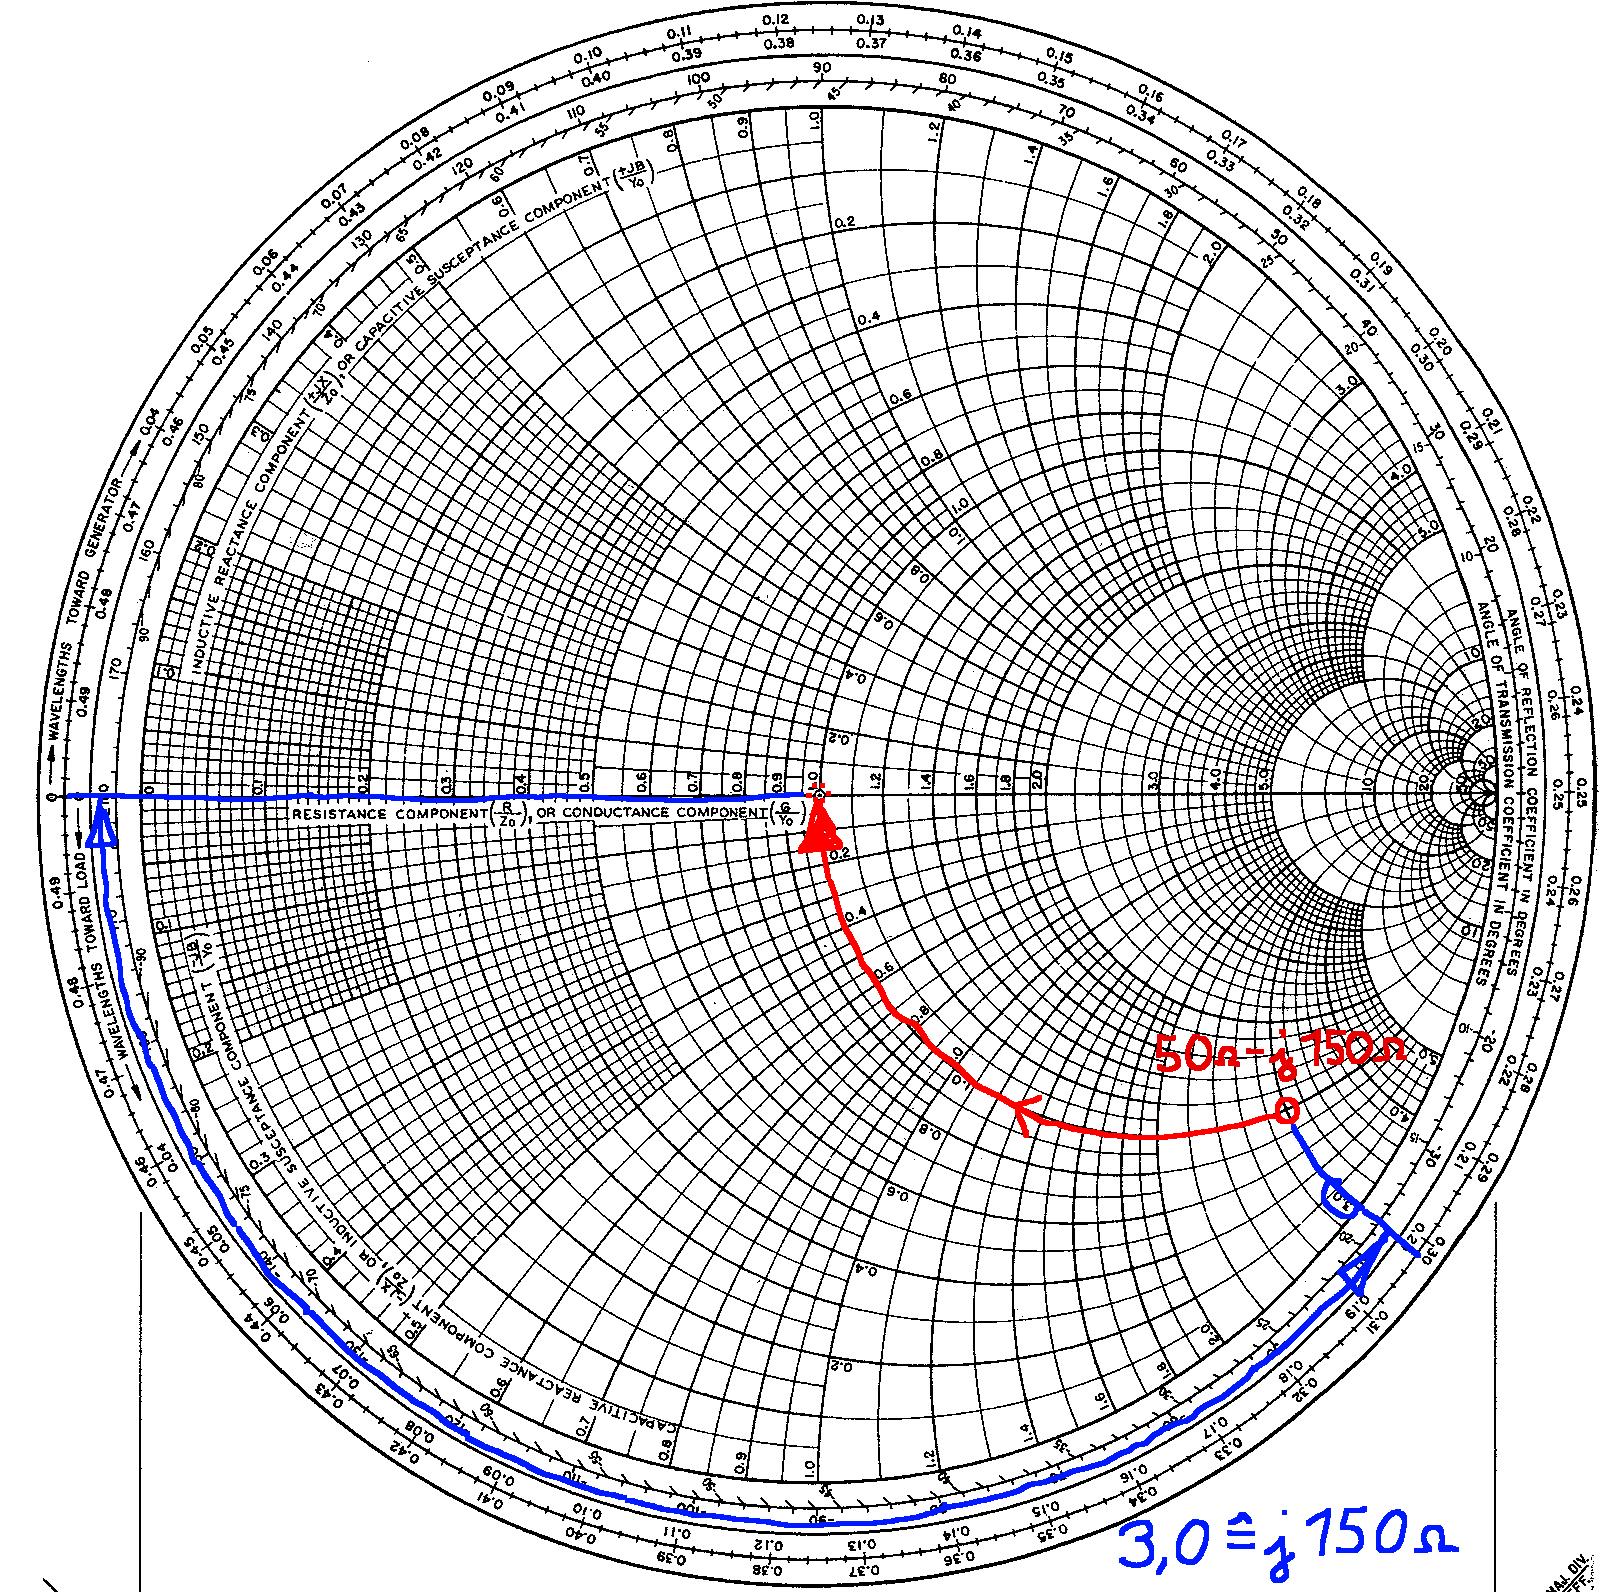 Tolle Kondensator Diagramm Symbol Fotos - Schaltplan Serie Circuit ...